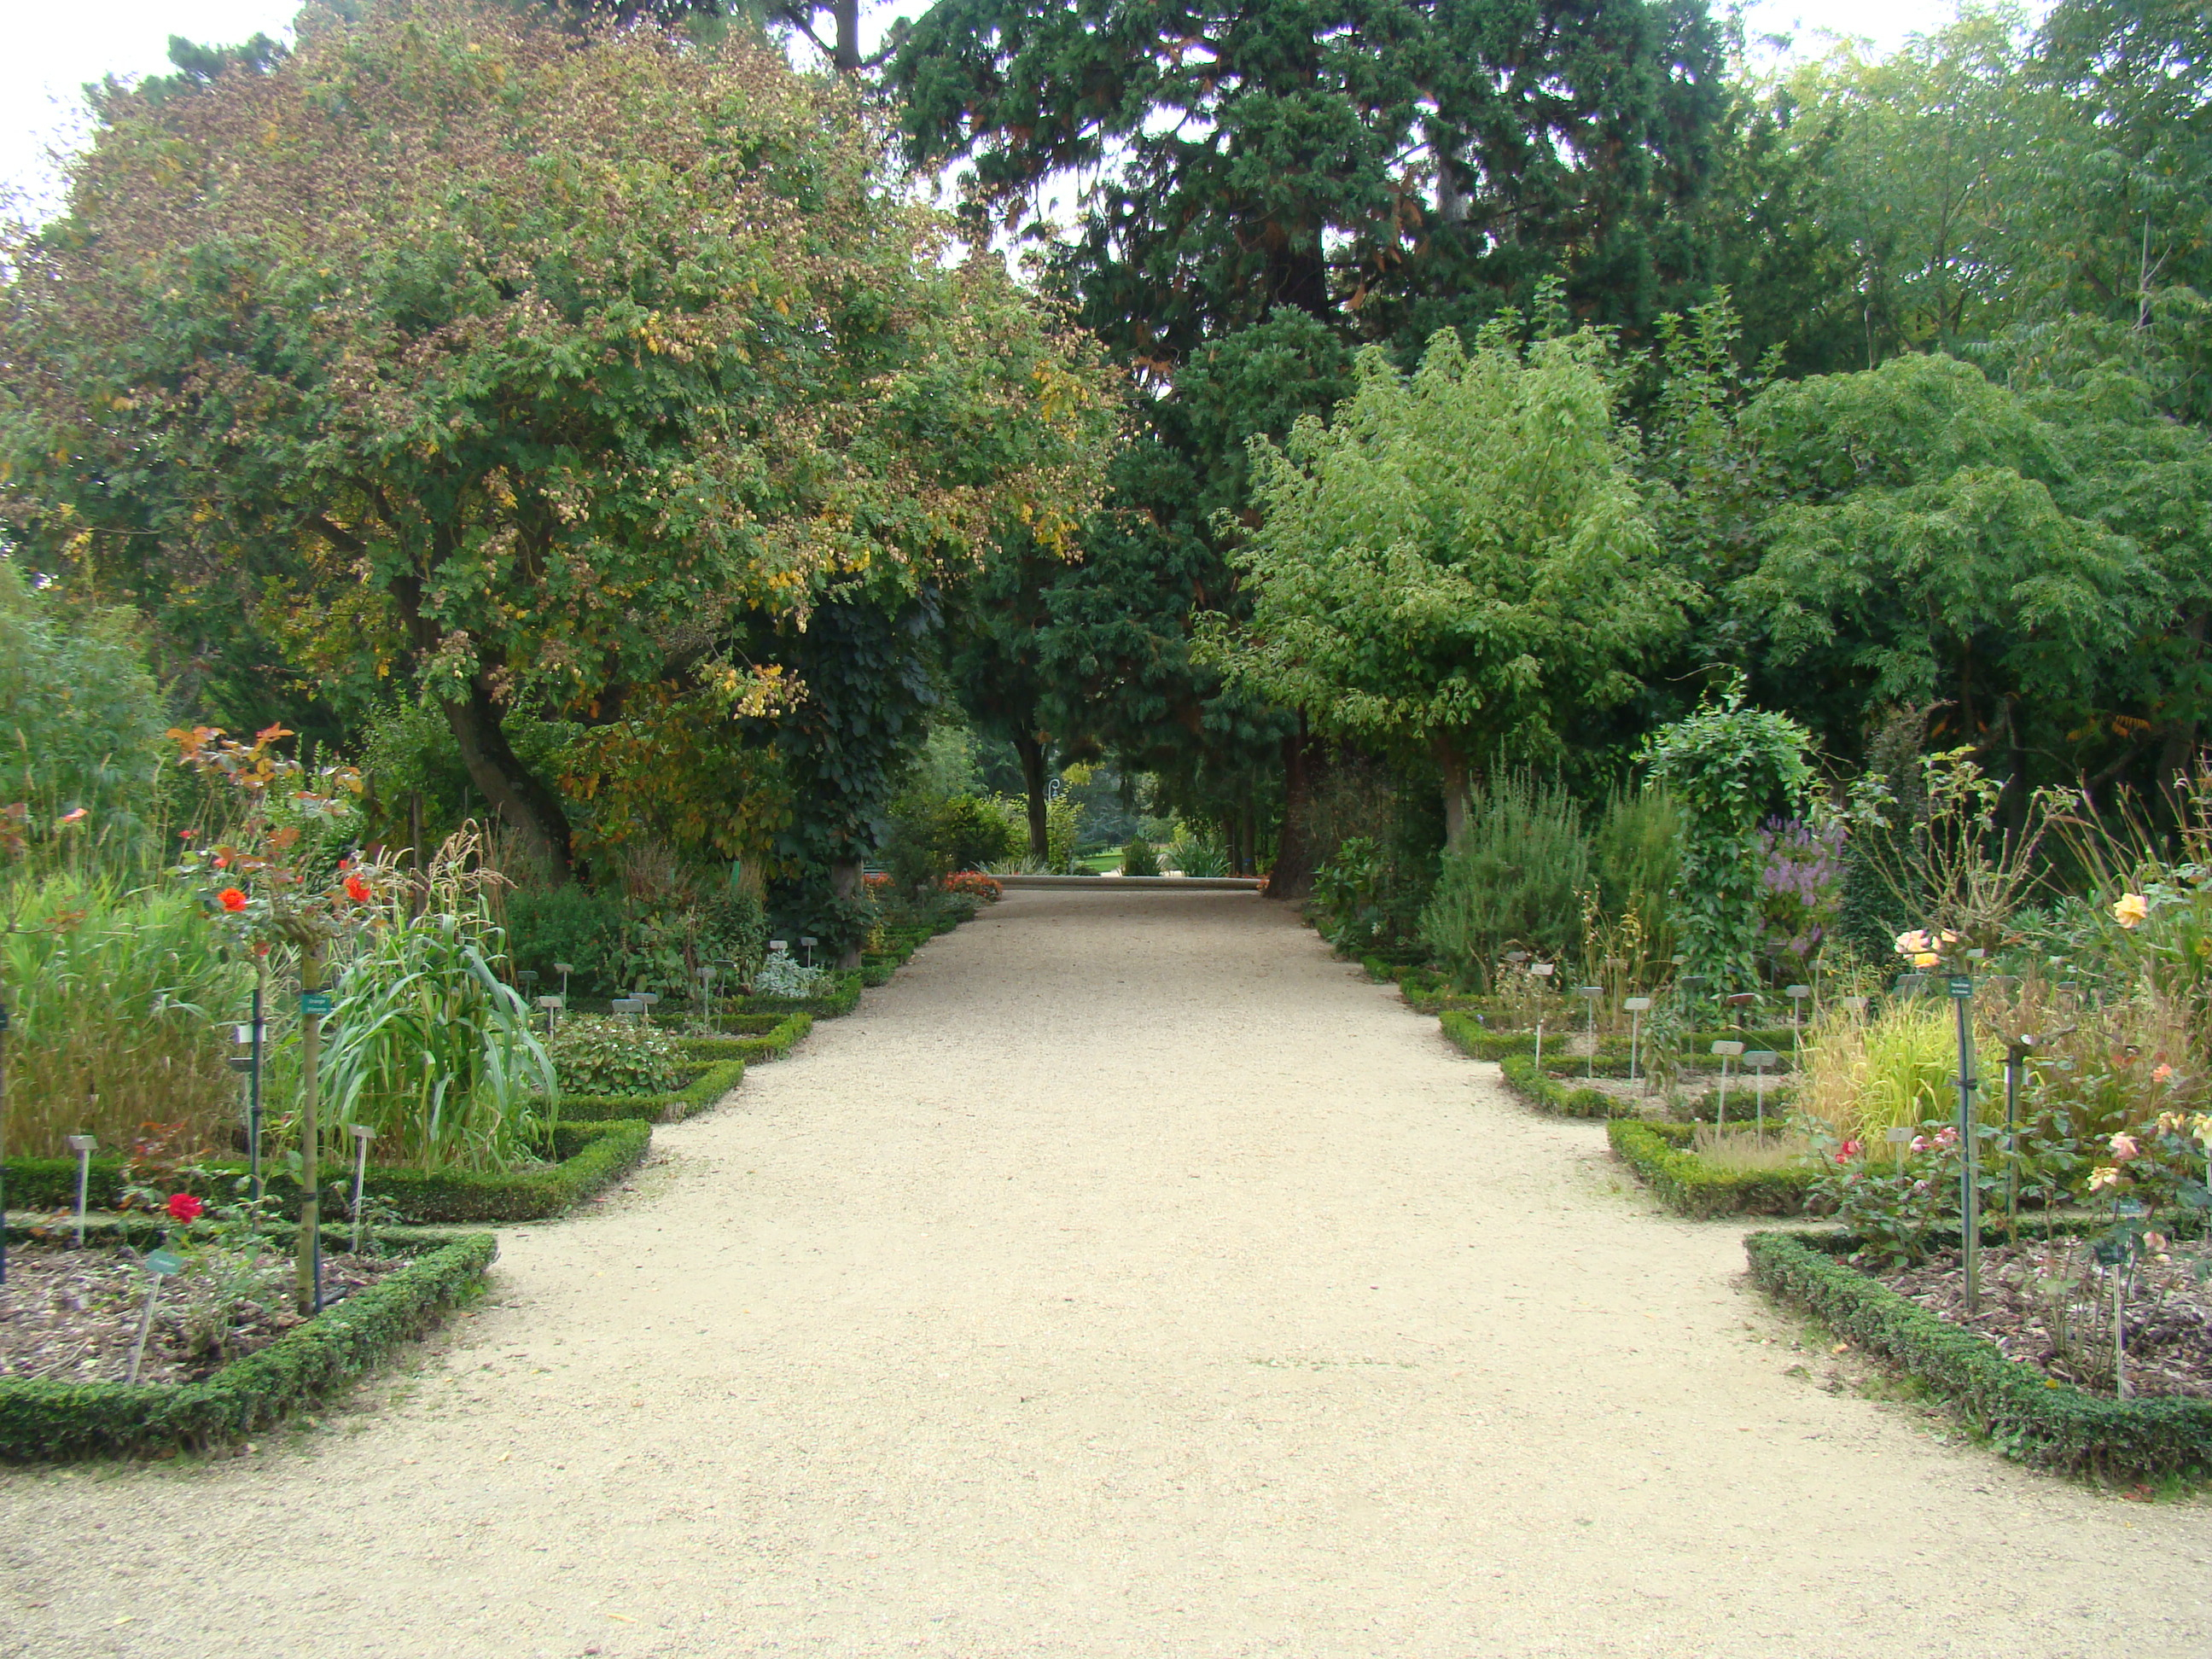 File:allée Jardin Botanique.jpg - Wikimedia Commons pour Allee De Jardin